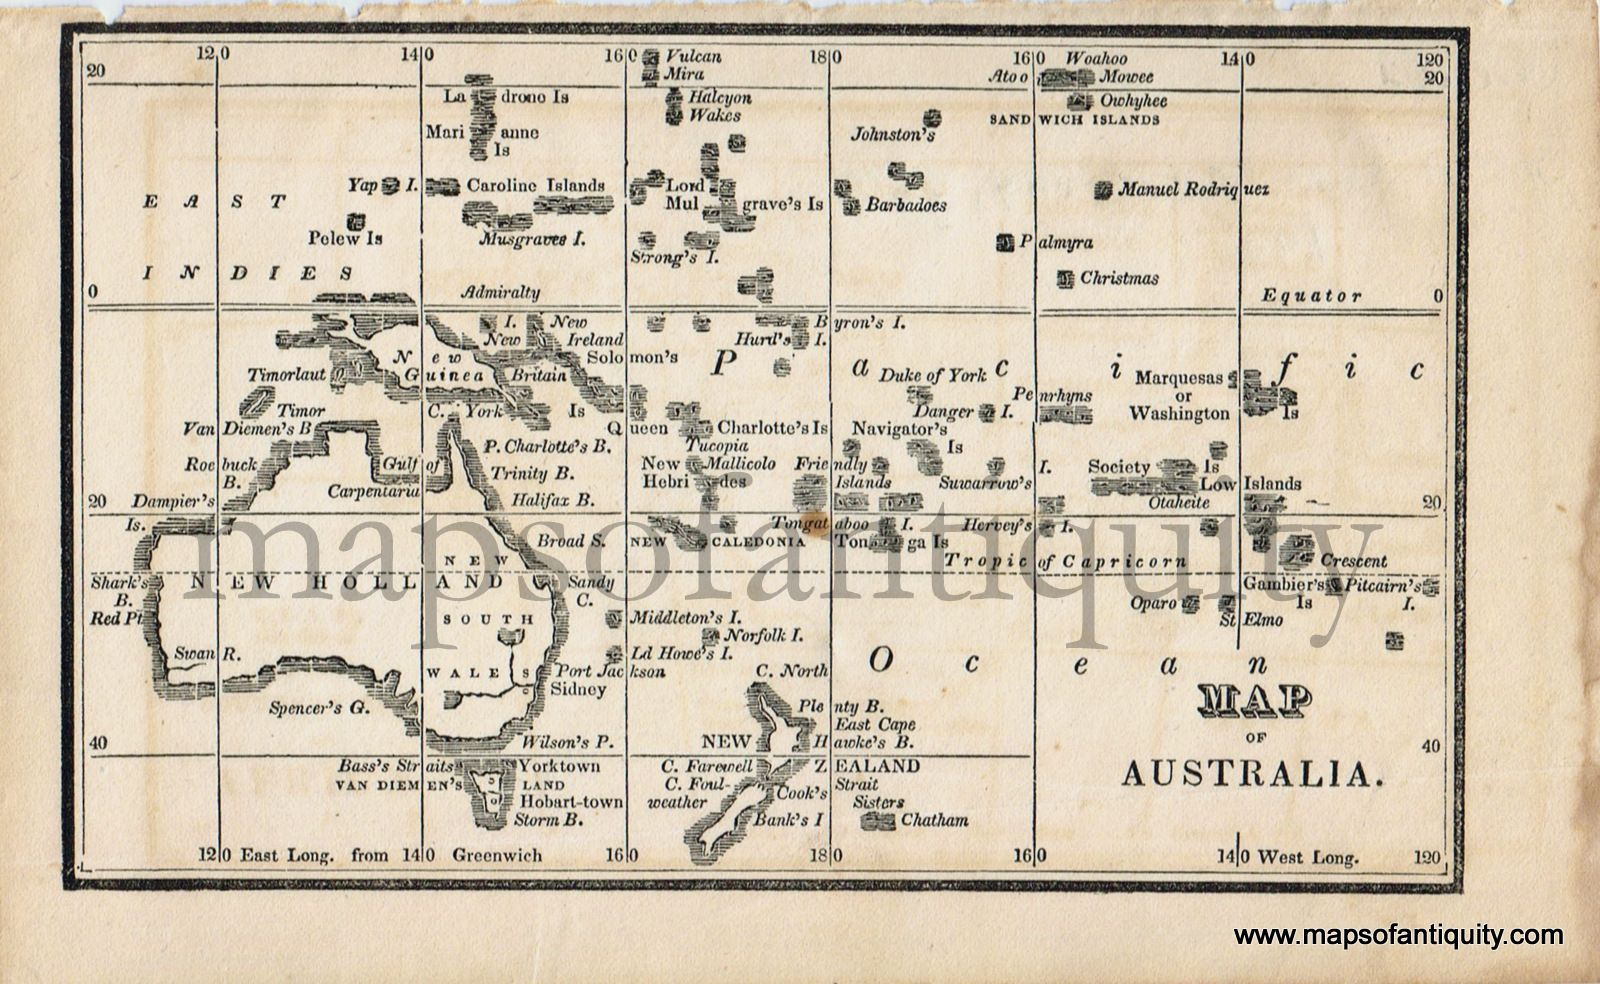 Map Of Australia 1830.Antique 1830 Map Of Australia From A Small Boston School